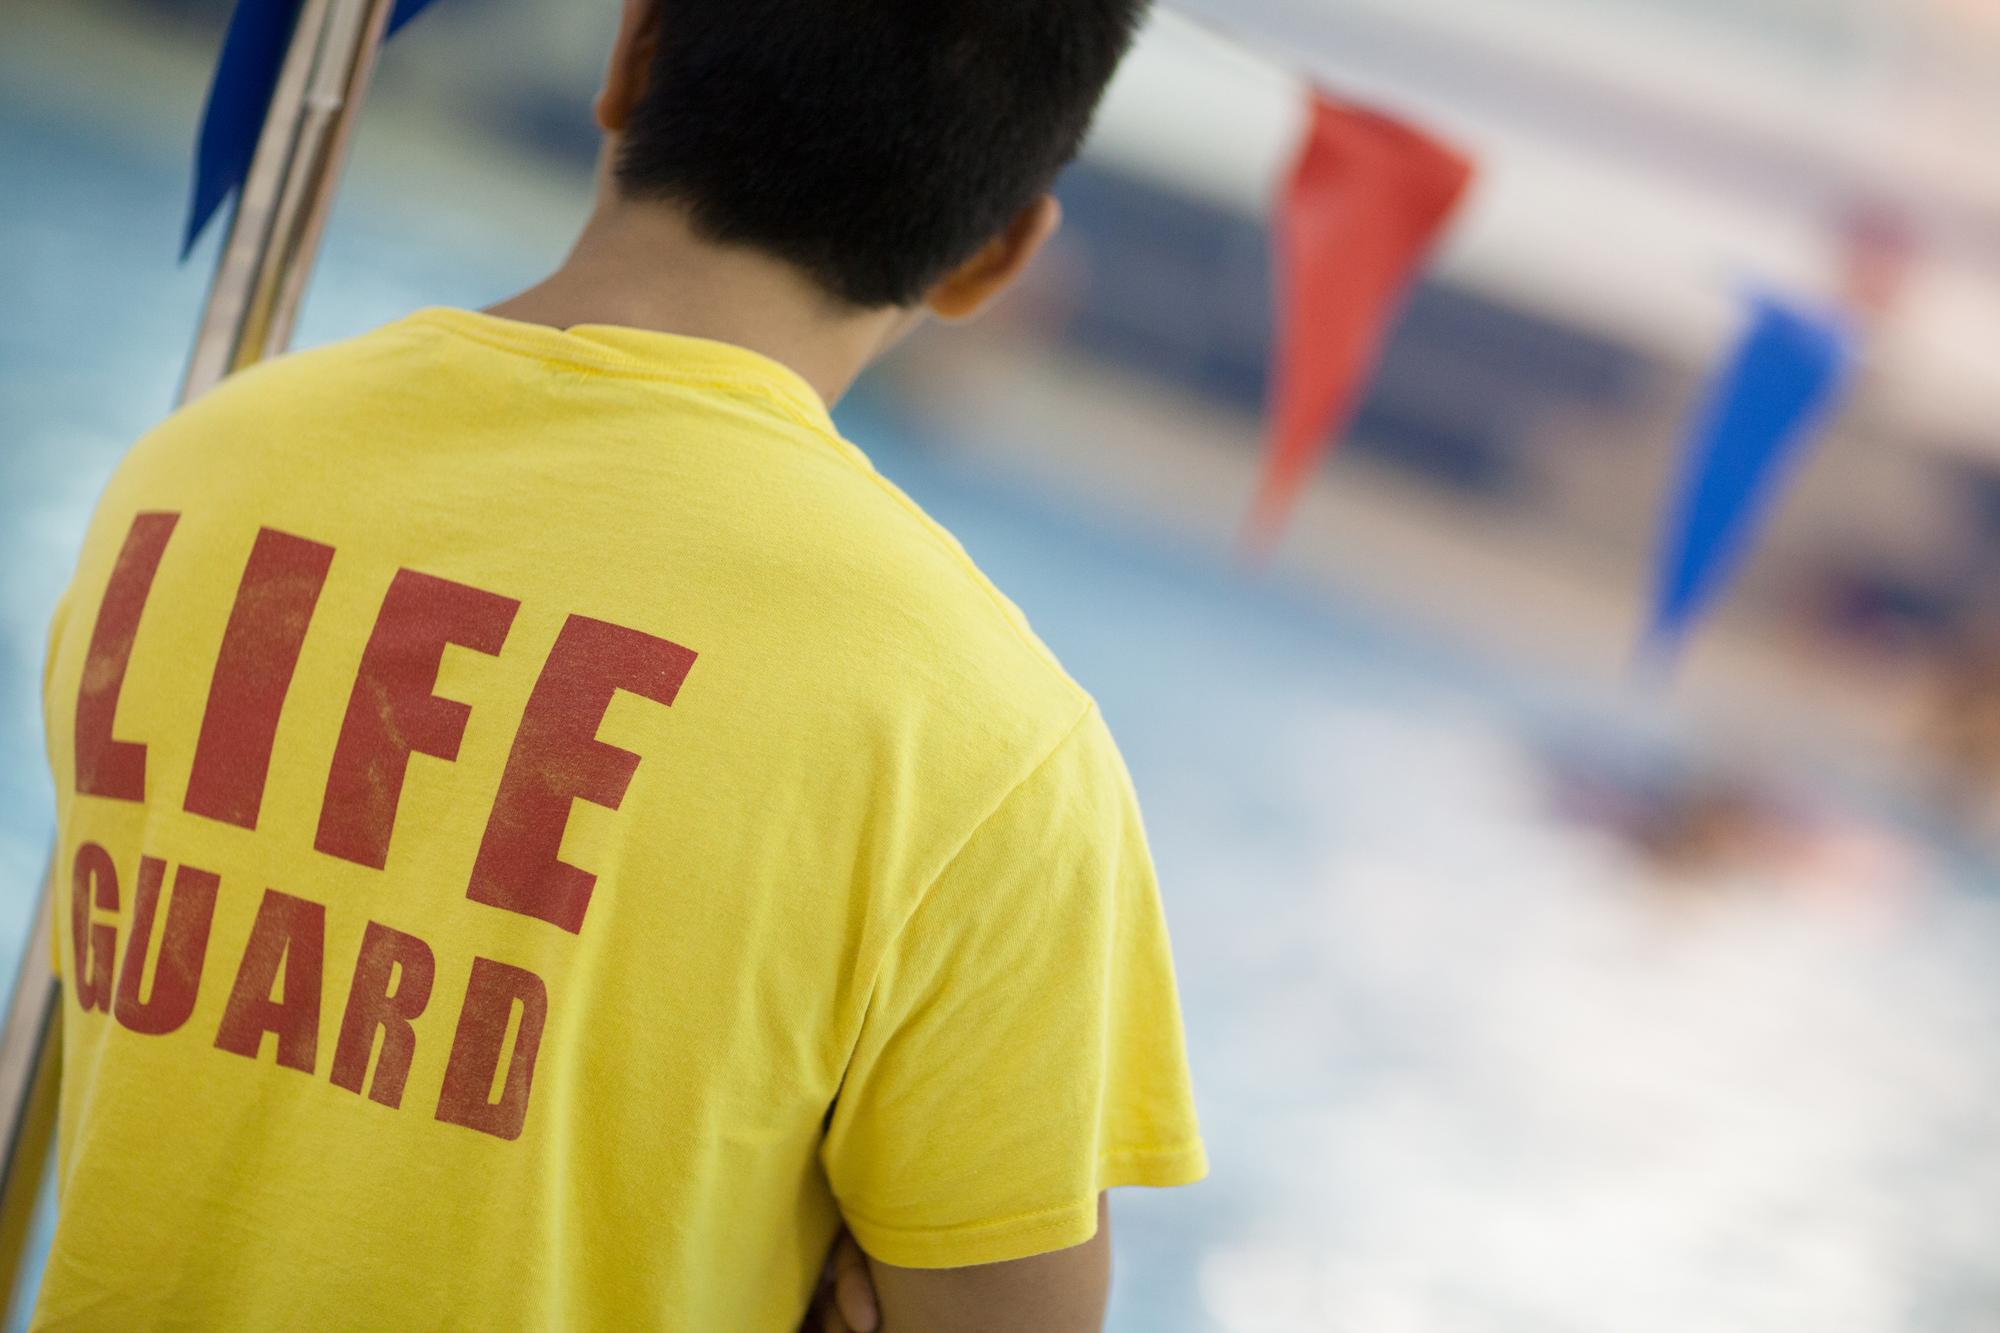 Rlss Lifeguard Course Nplq Dulwich College Sports Club